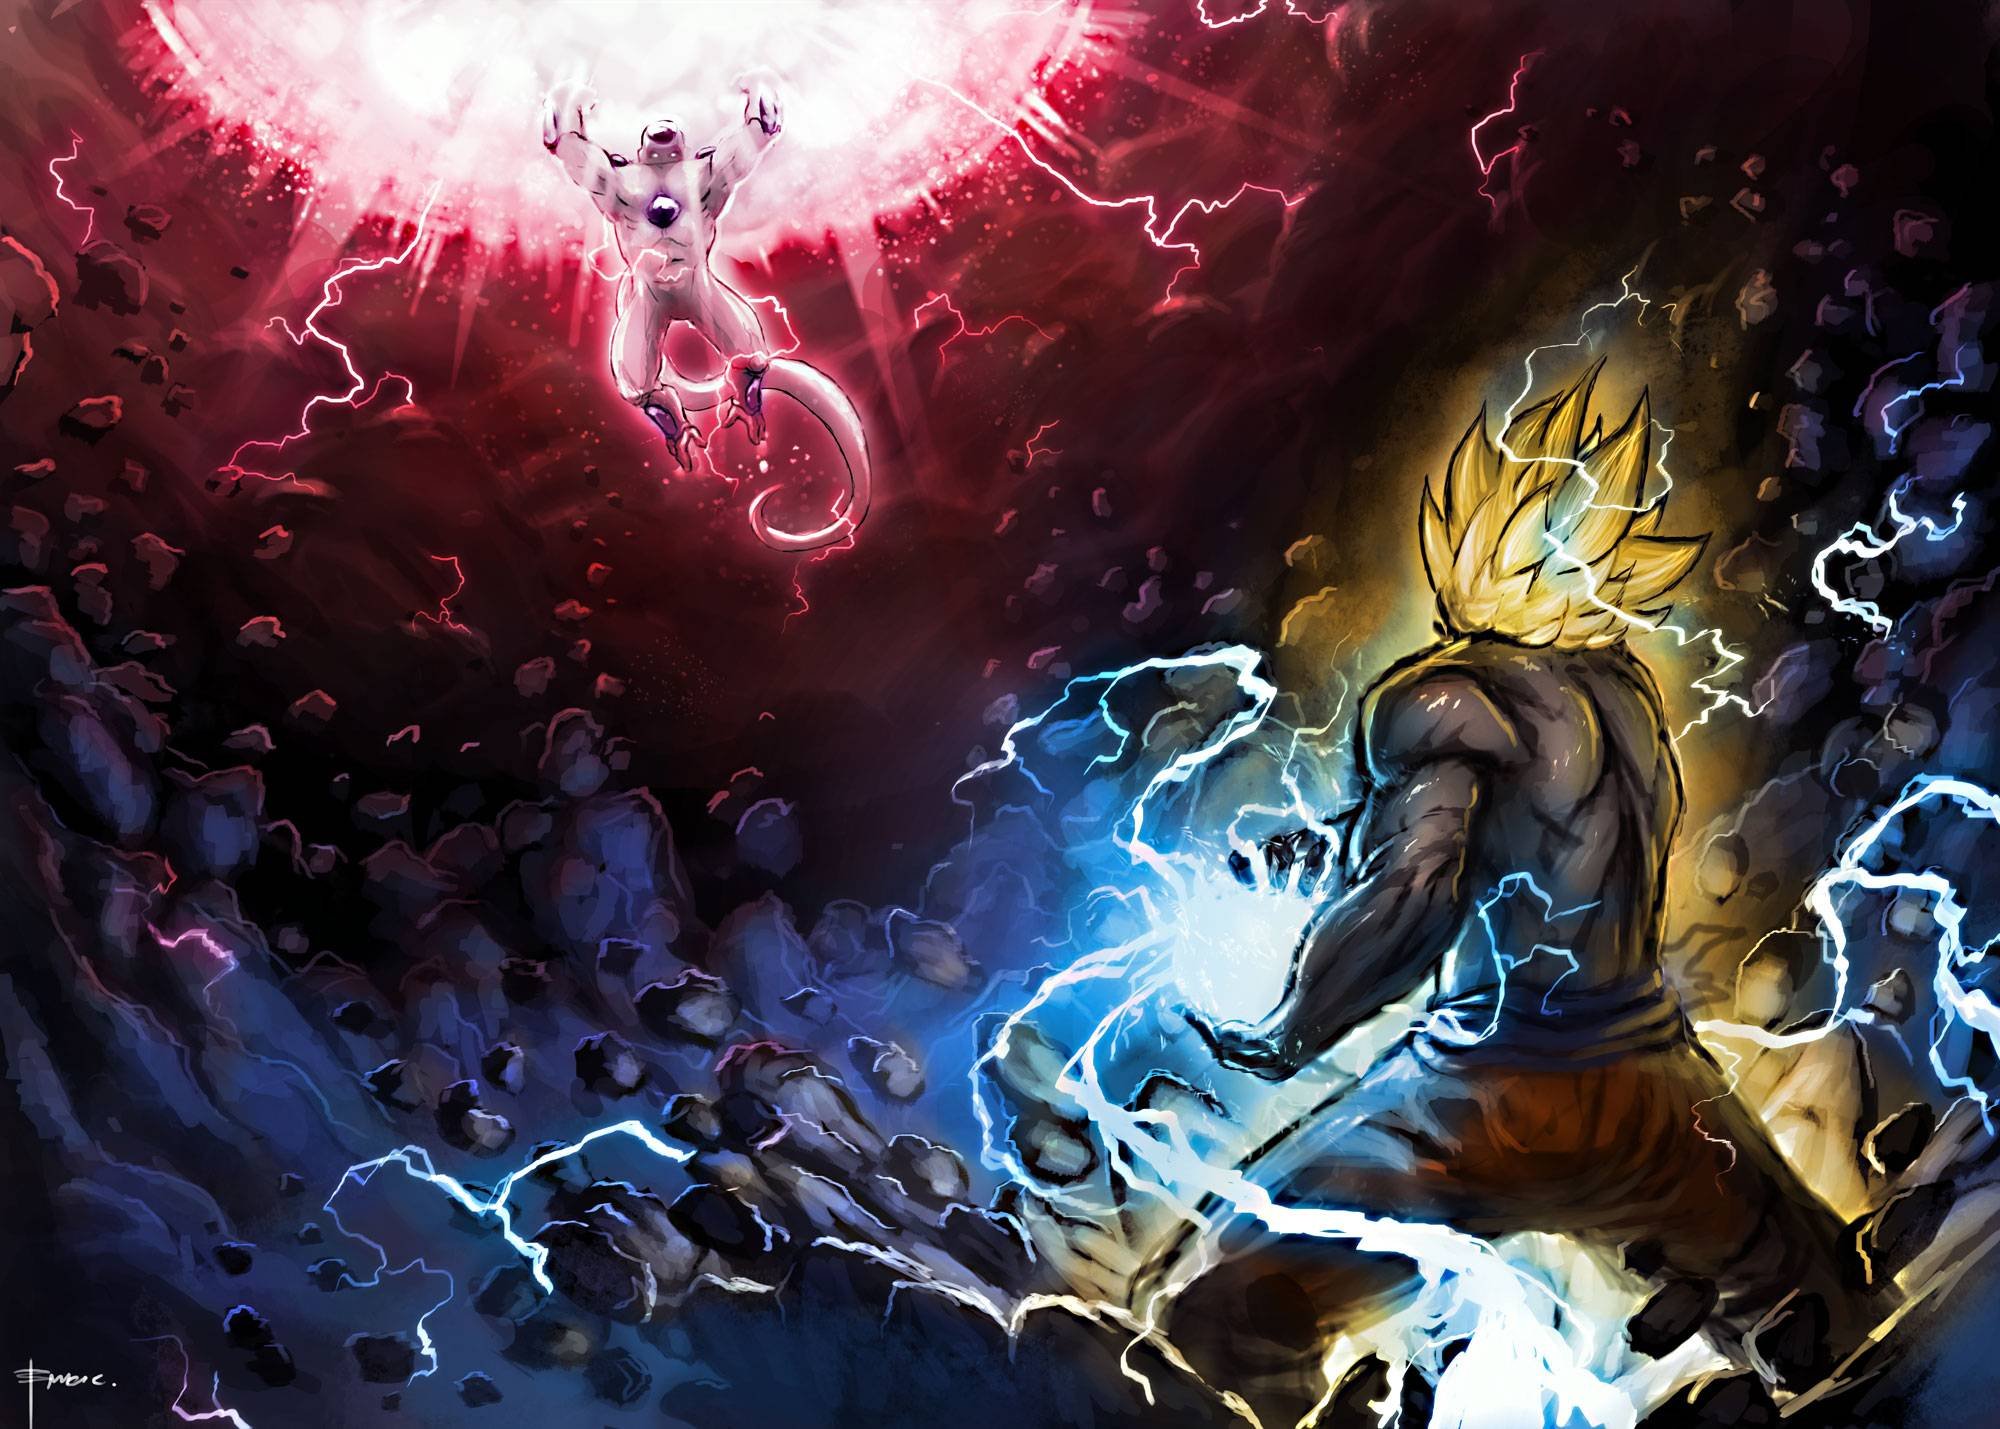 Goku vs Frieza   DragonBall z Wallpaper 2000x1429